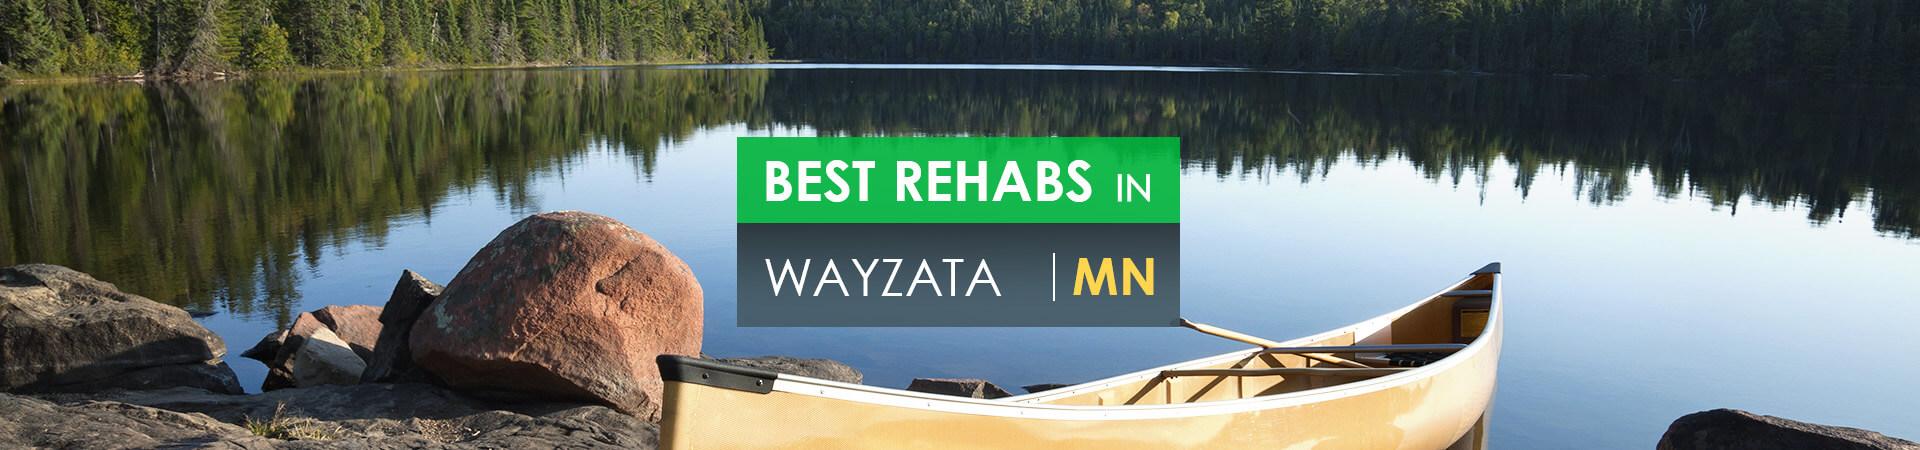 Best rehabs in Wayzata, MN